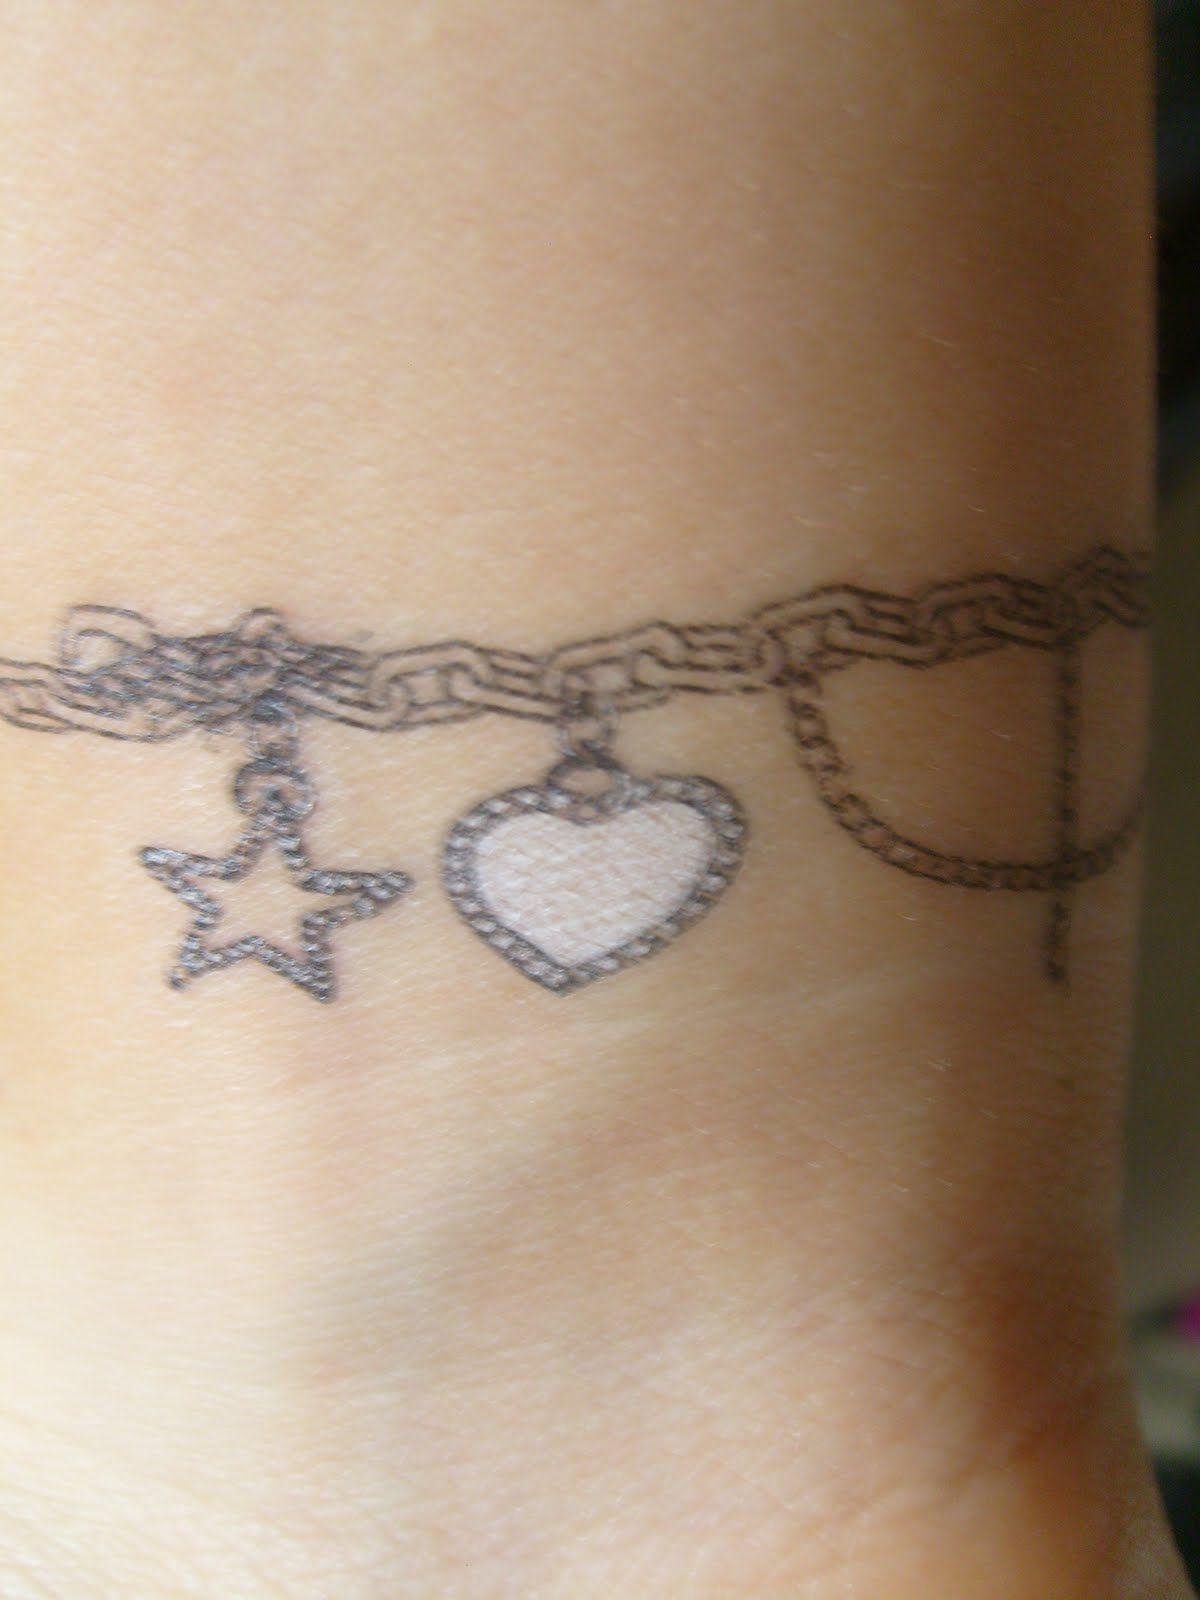 Ankle Bracelet Tattoos - Google